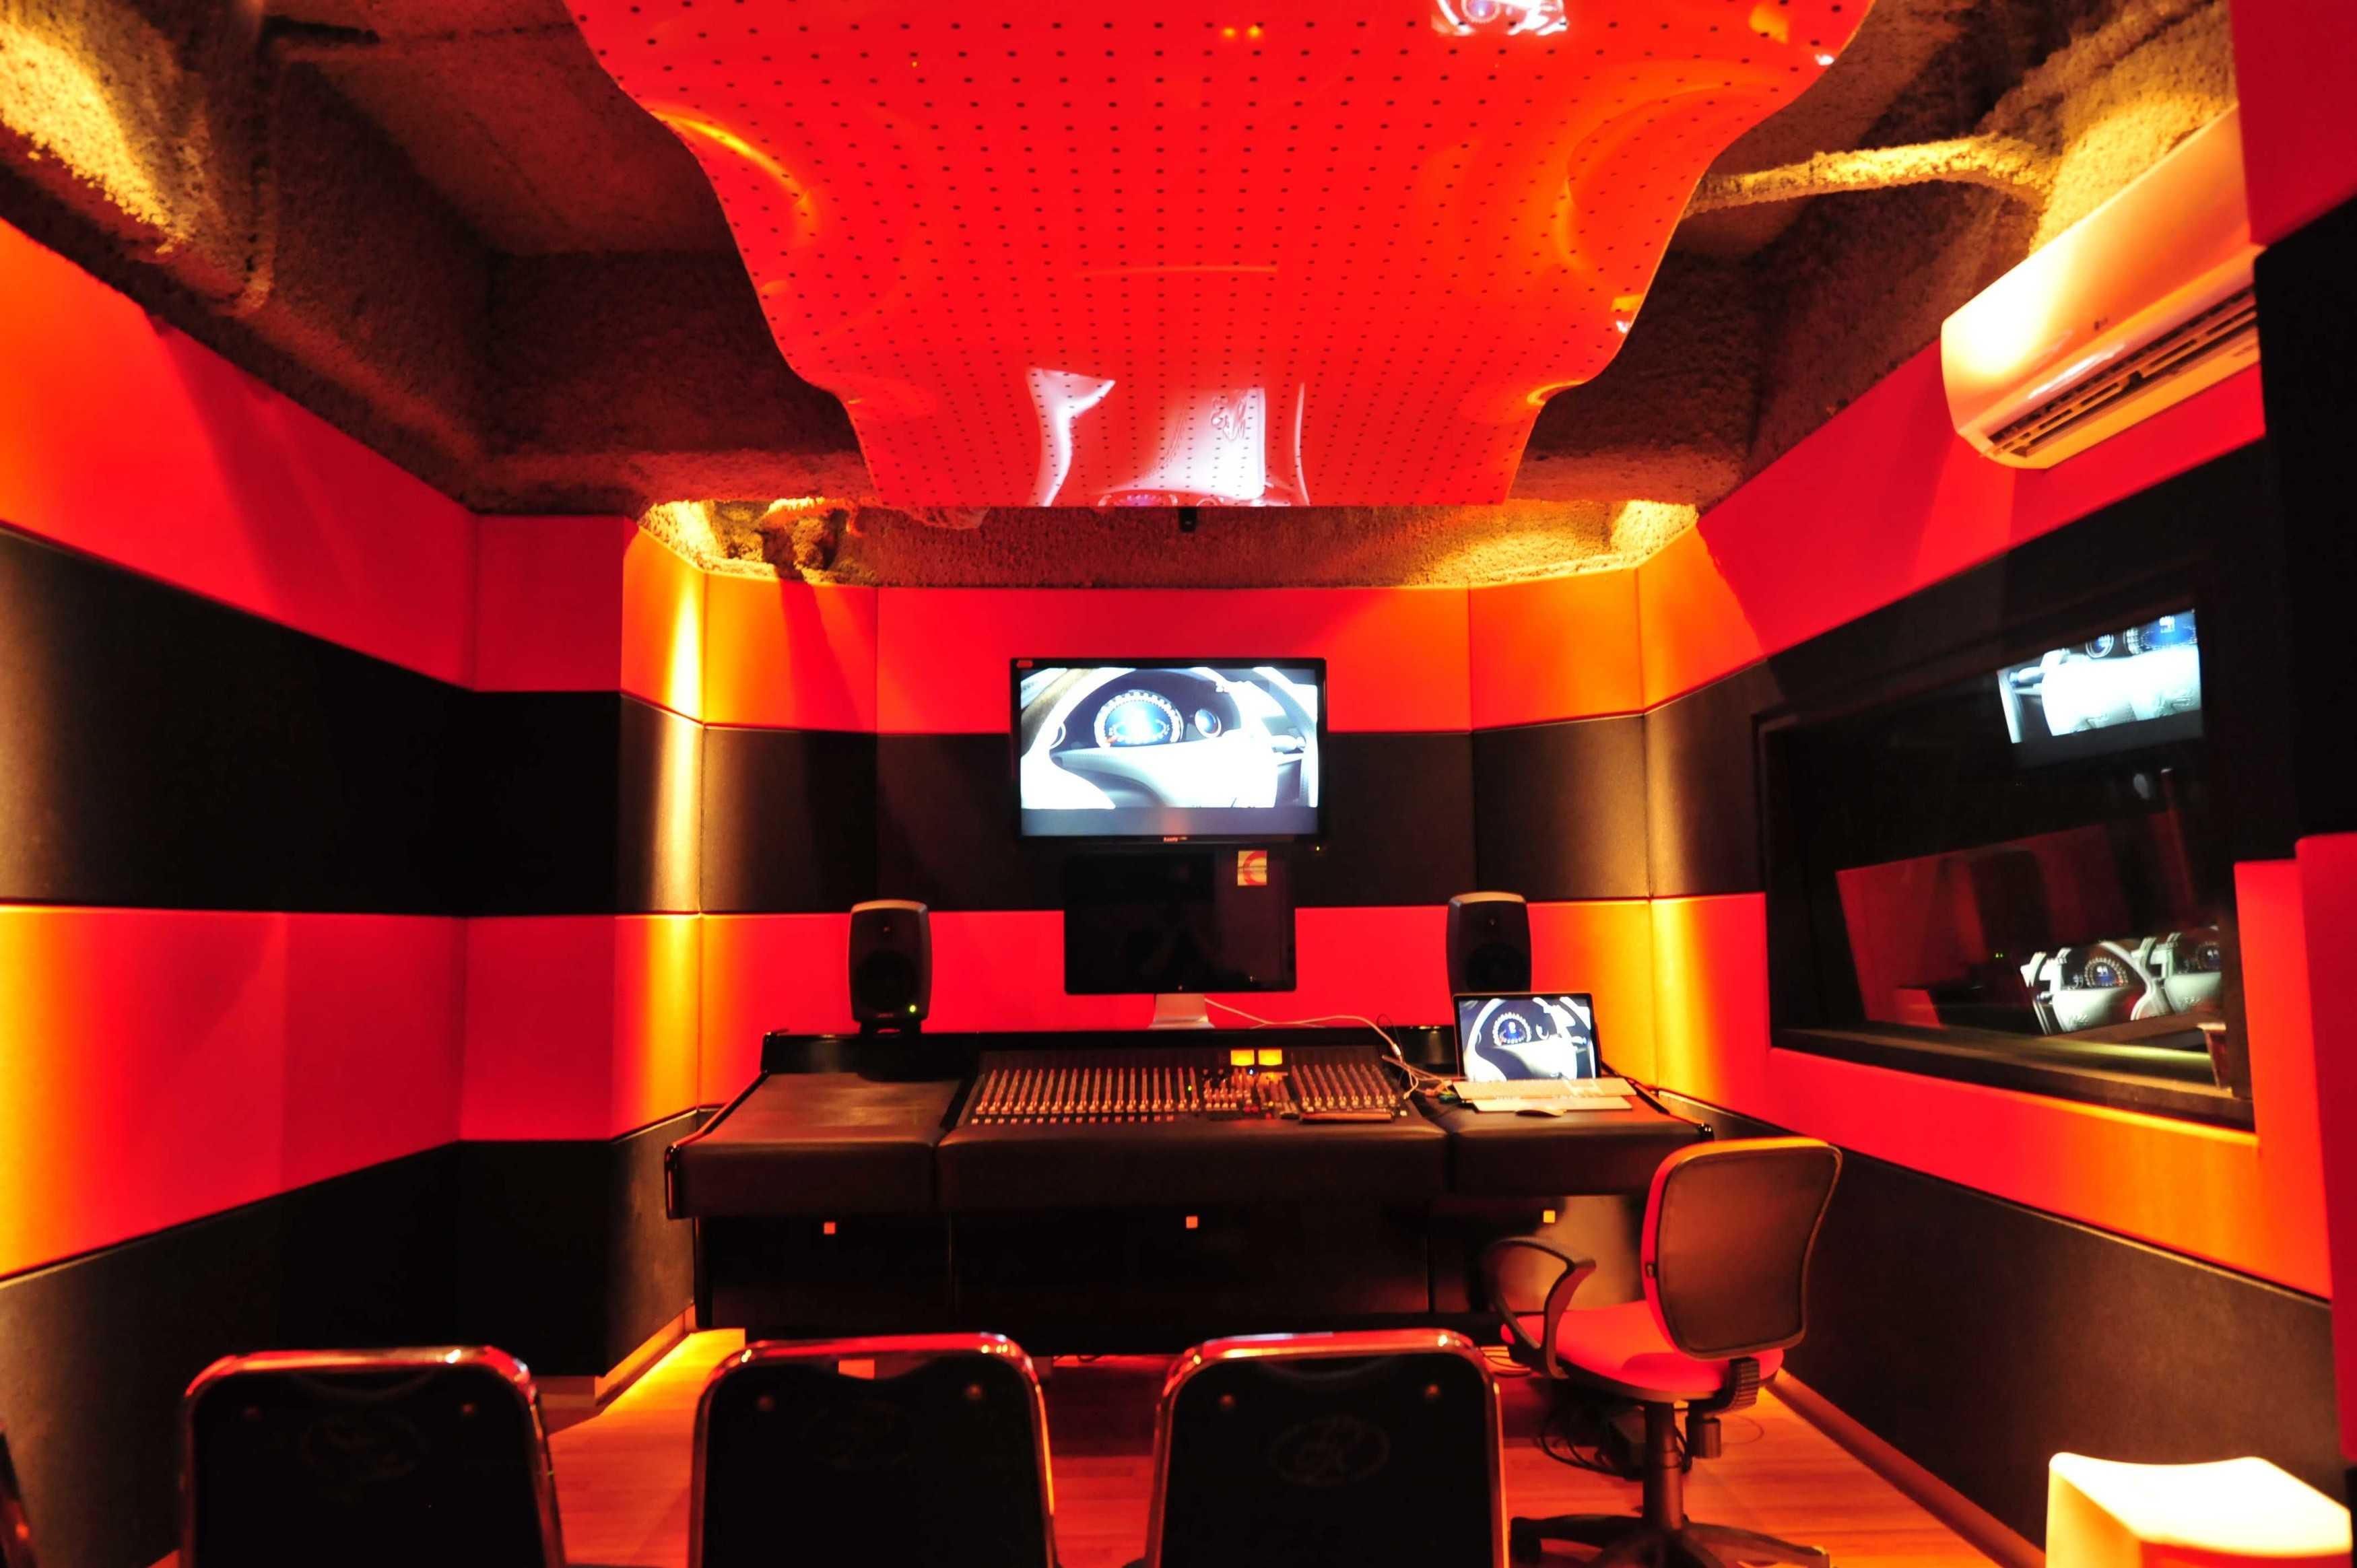 Aqustica Ssr School Of Sound Recording Jakarta Jakarta, Indonesia Jakarta, Indonesia 7-Control-Room-Gs-R24 Modern  29757